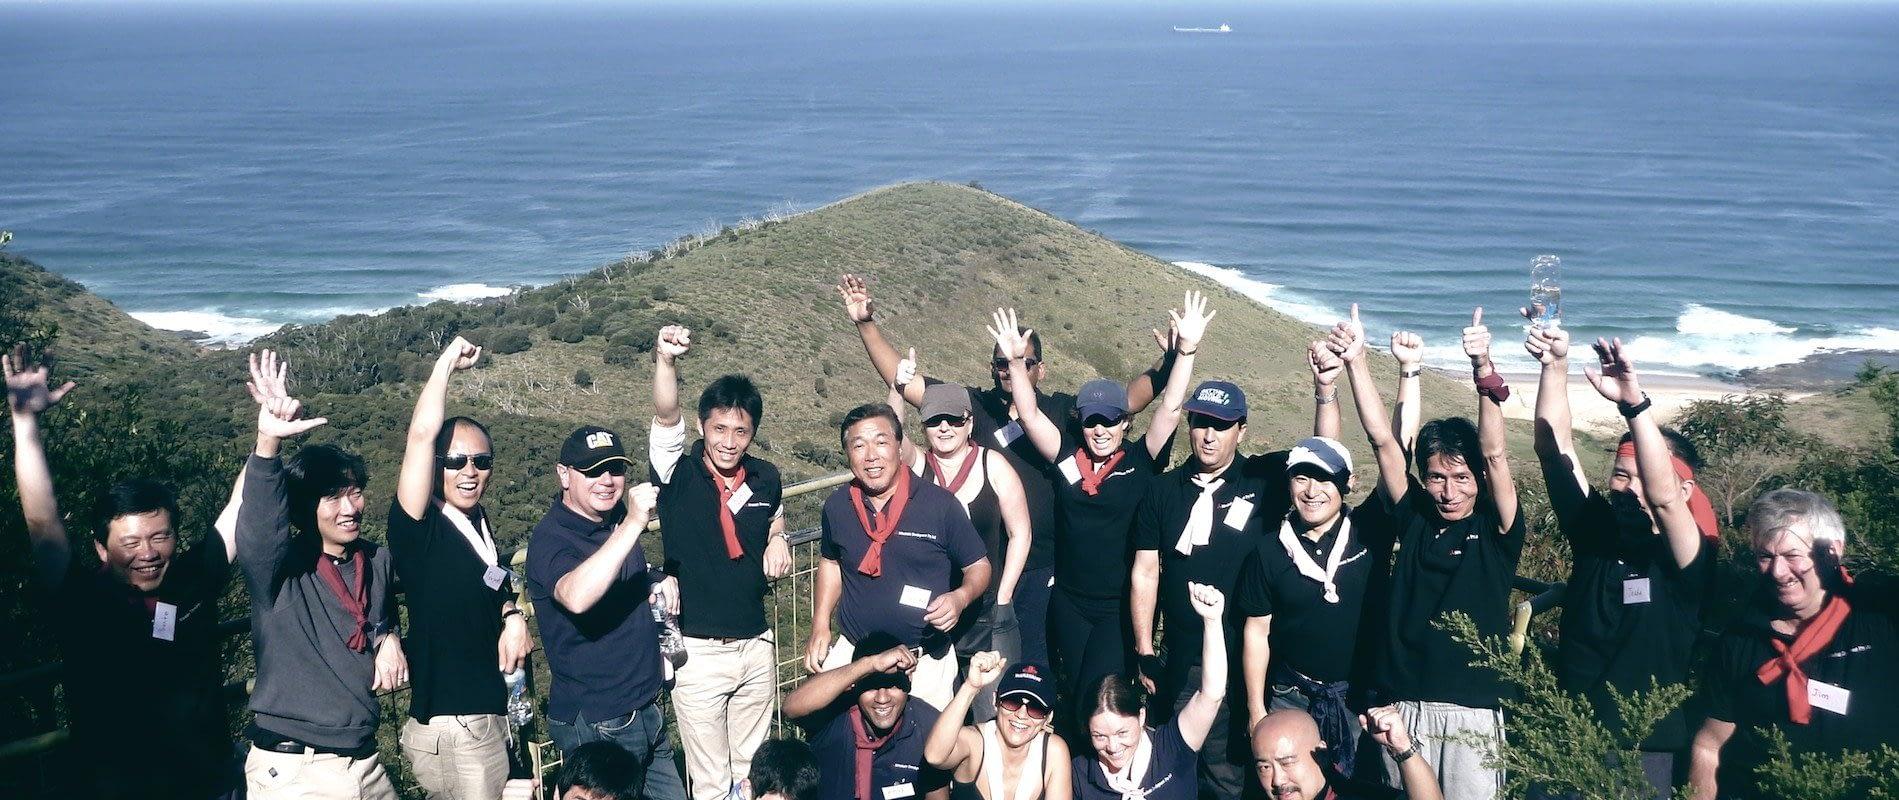 https://mlcb8szwyxfv.i.optimole.com/tTCGqh8-D2NWK4c9/w:auto/h:auto/q:auto/https://www.uniqueteambuilding.com.au/wp-content/uploads/2014/06/team-building-2.jpg